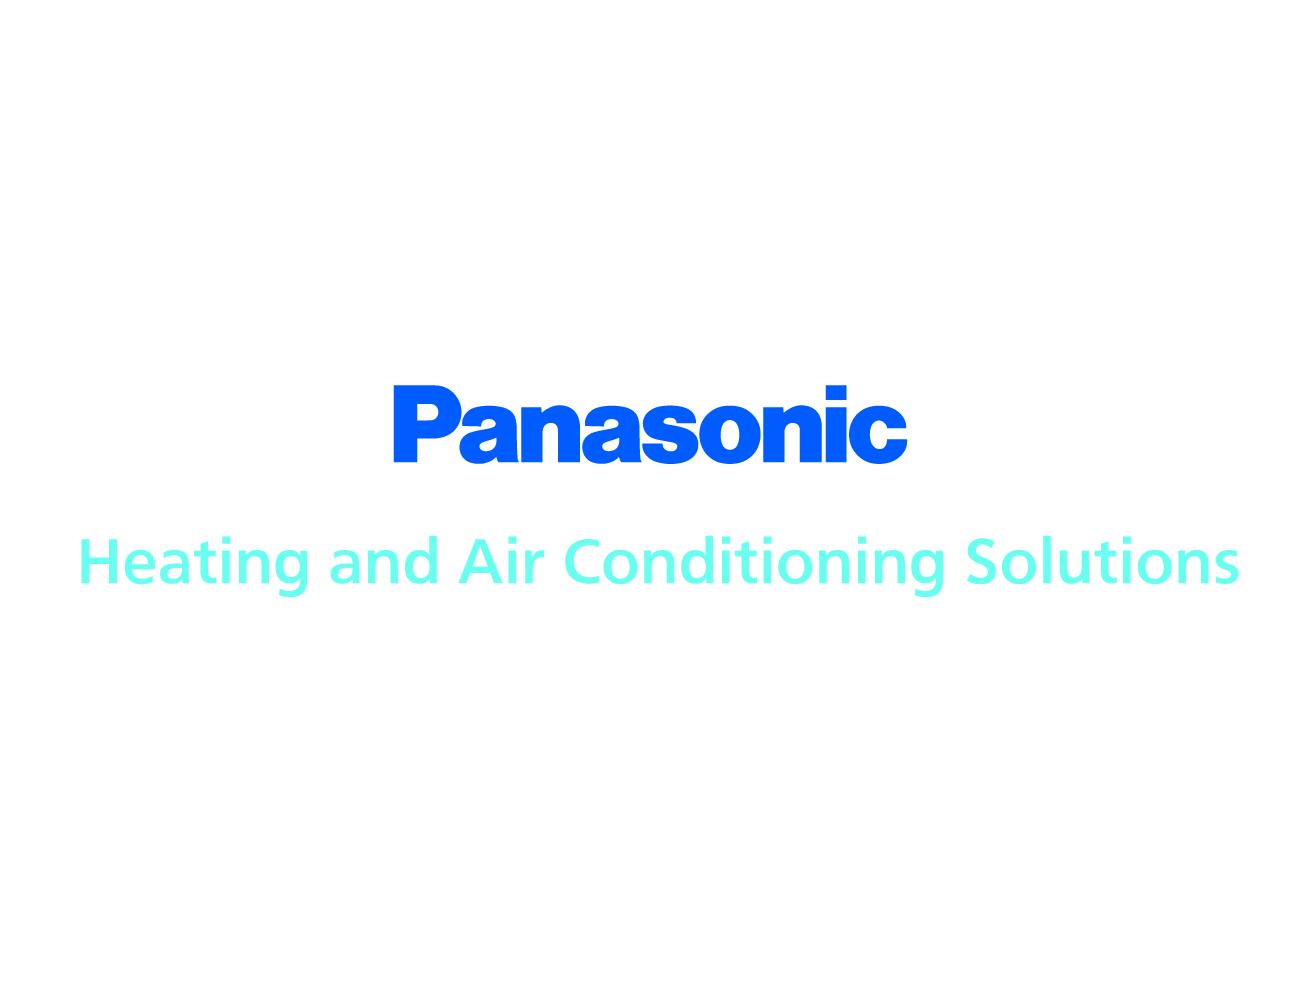 Panasonic_HACS_lockup_CMYK.jpg